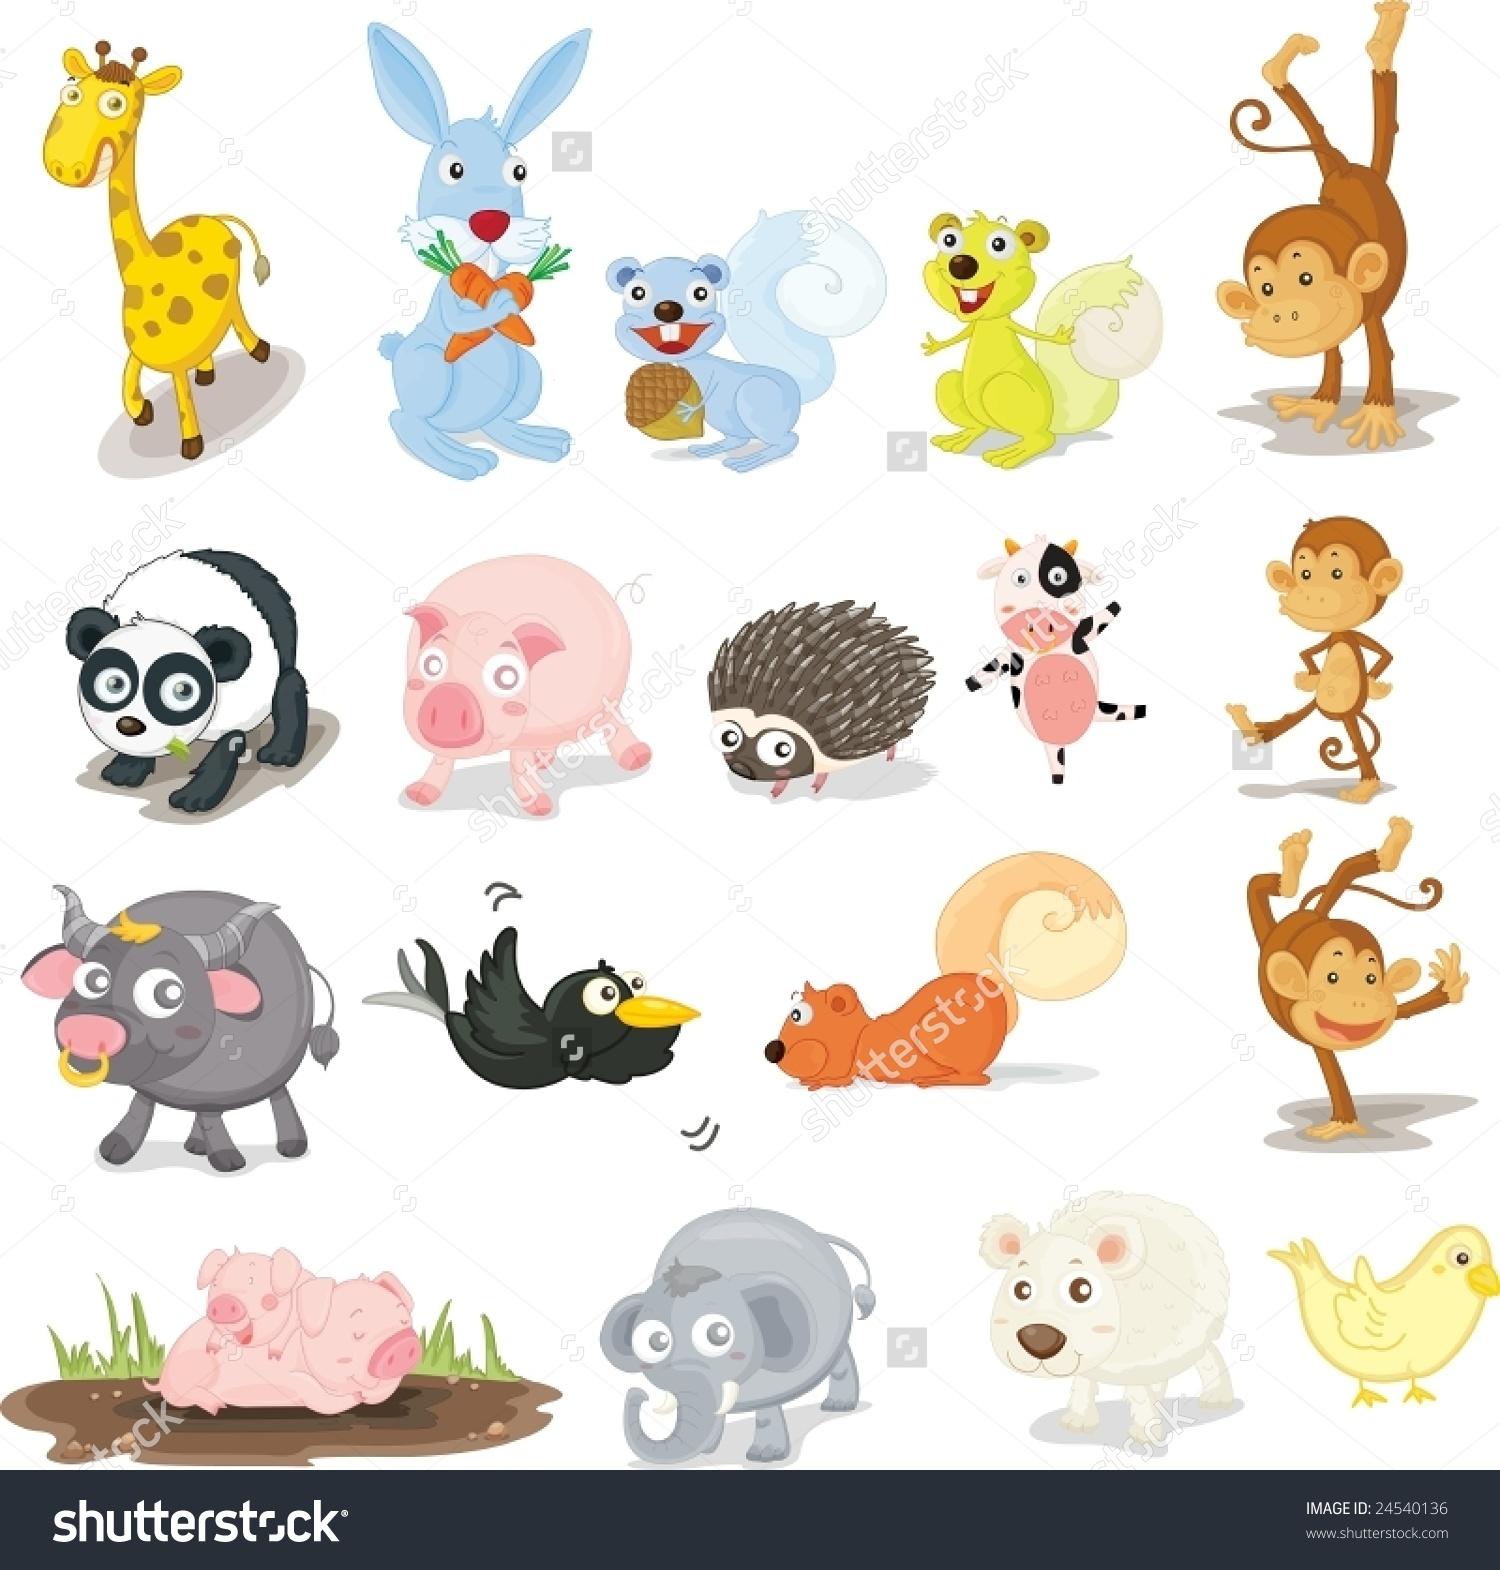 Illustration Variety Animals Stock Vector 24540136.